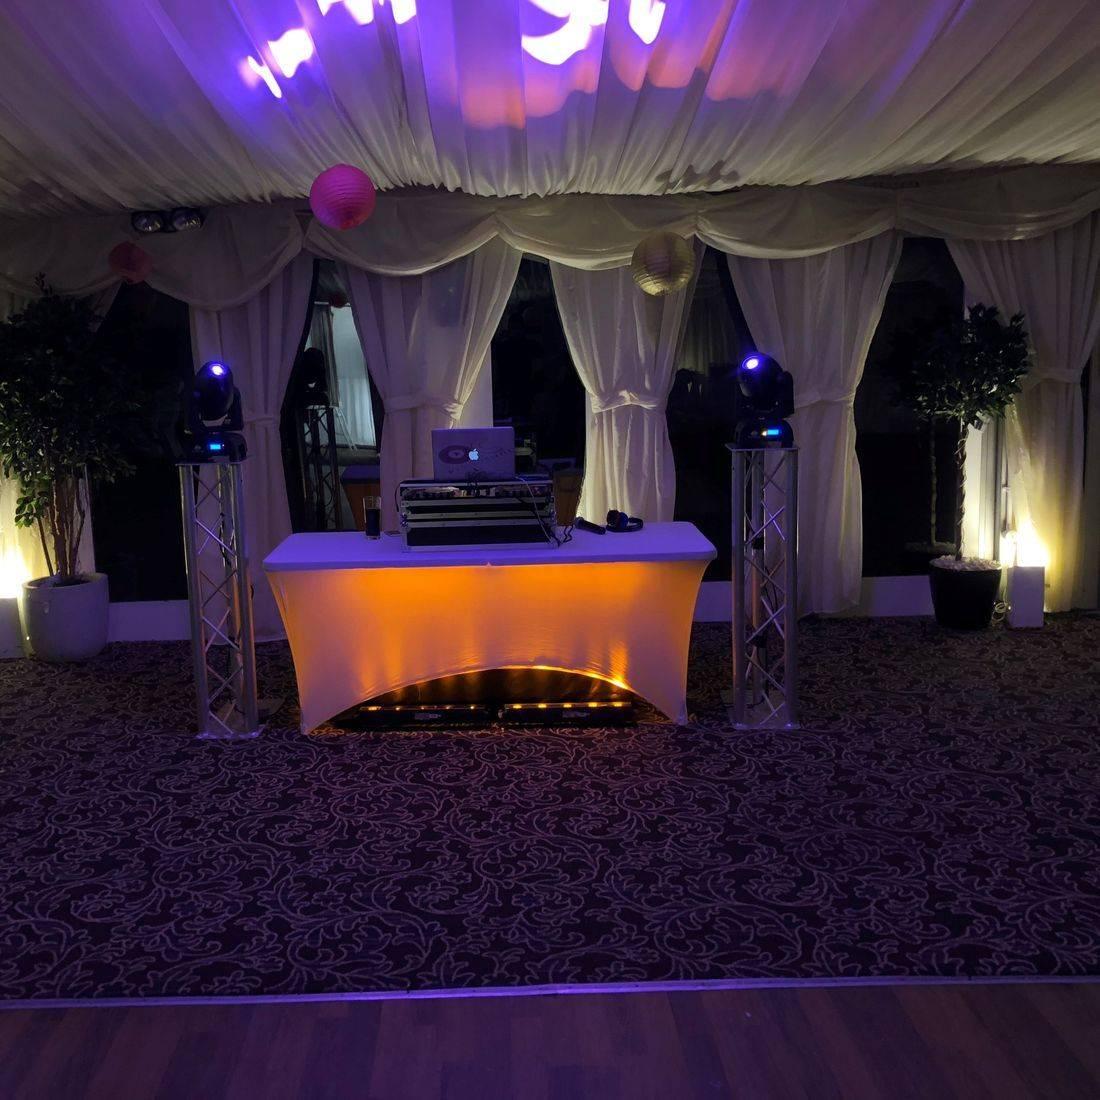 New Hall Hotel Wedding Venue  DJ wEDDING dj